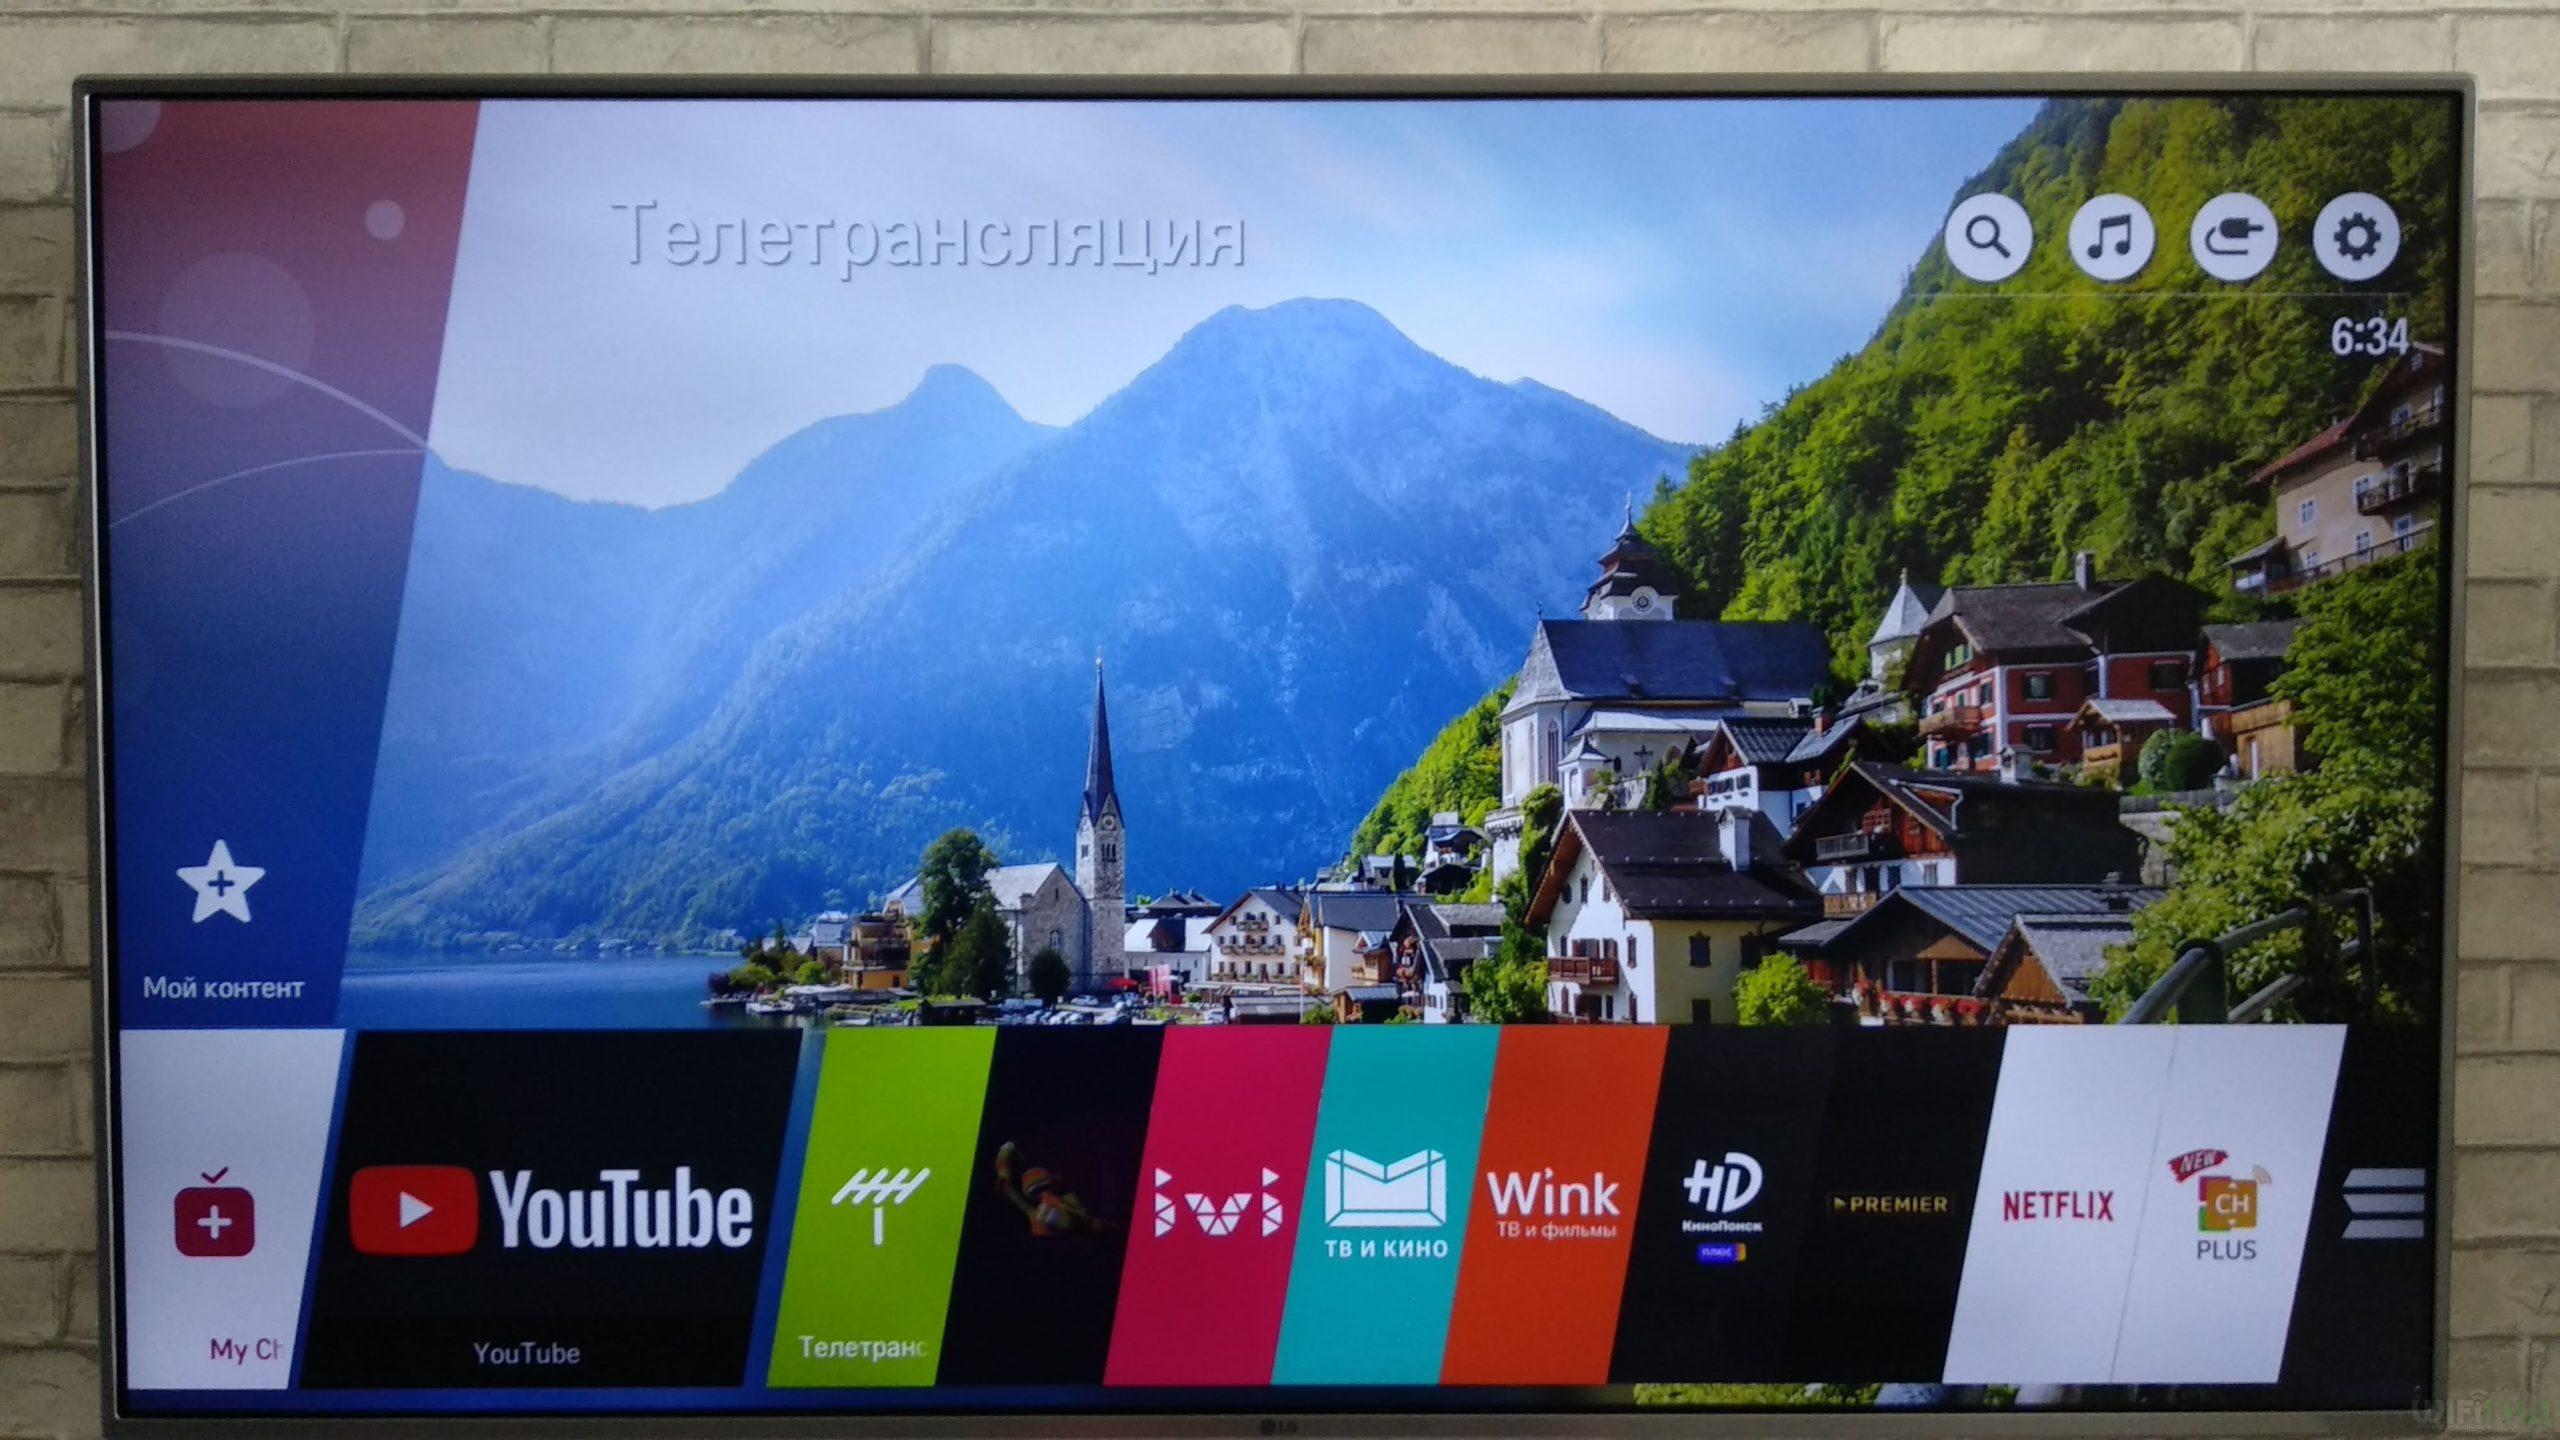 Как скачать YouTube на телевизор LG Smart TV: установка, настройка и решение проблем